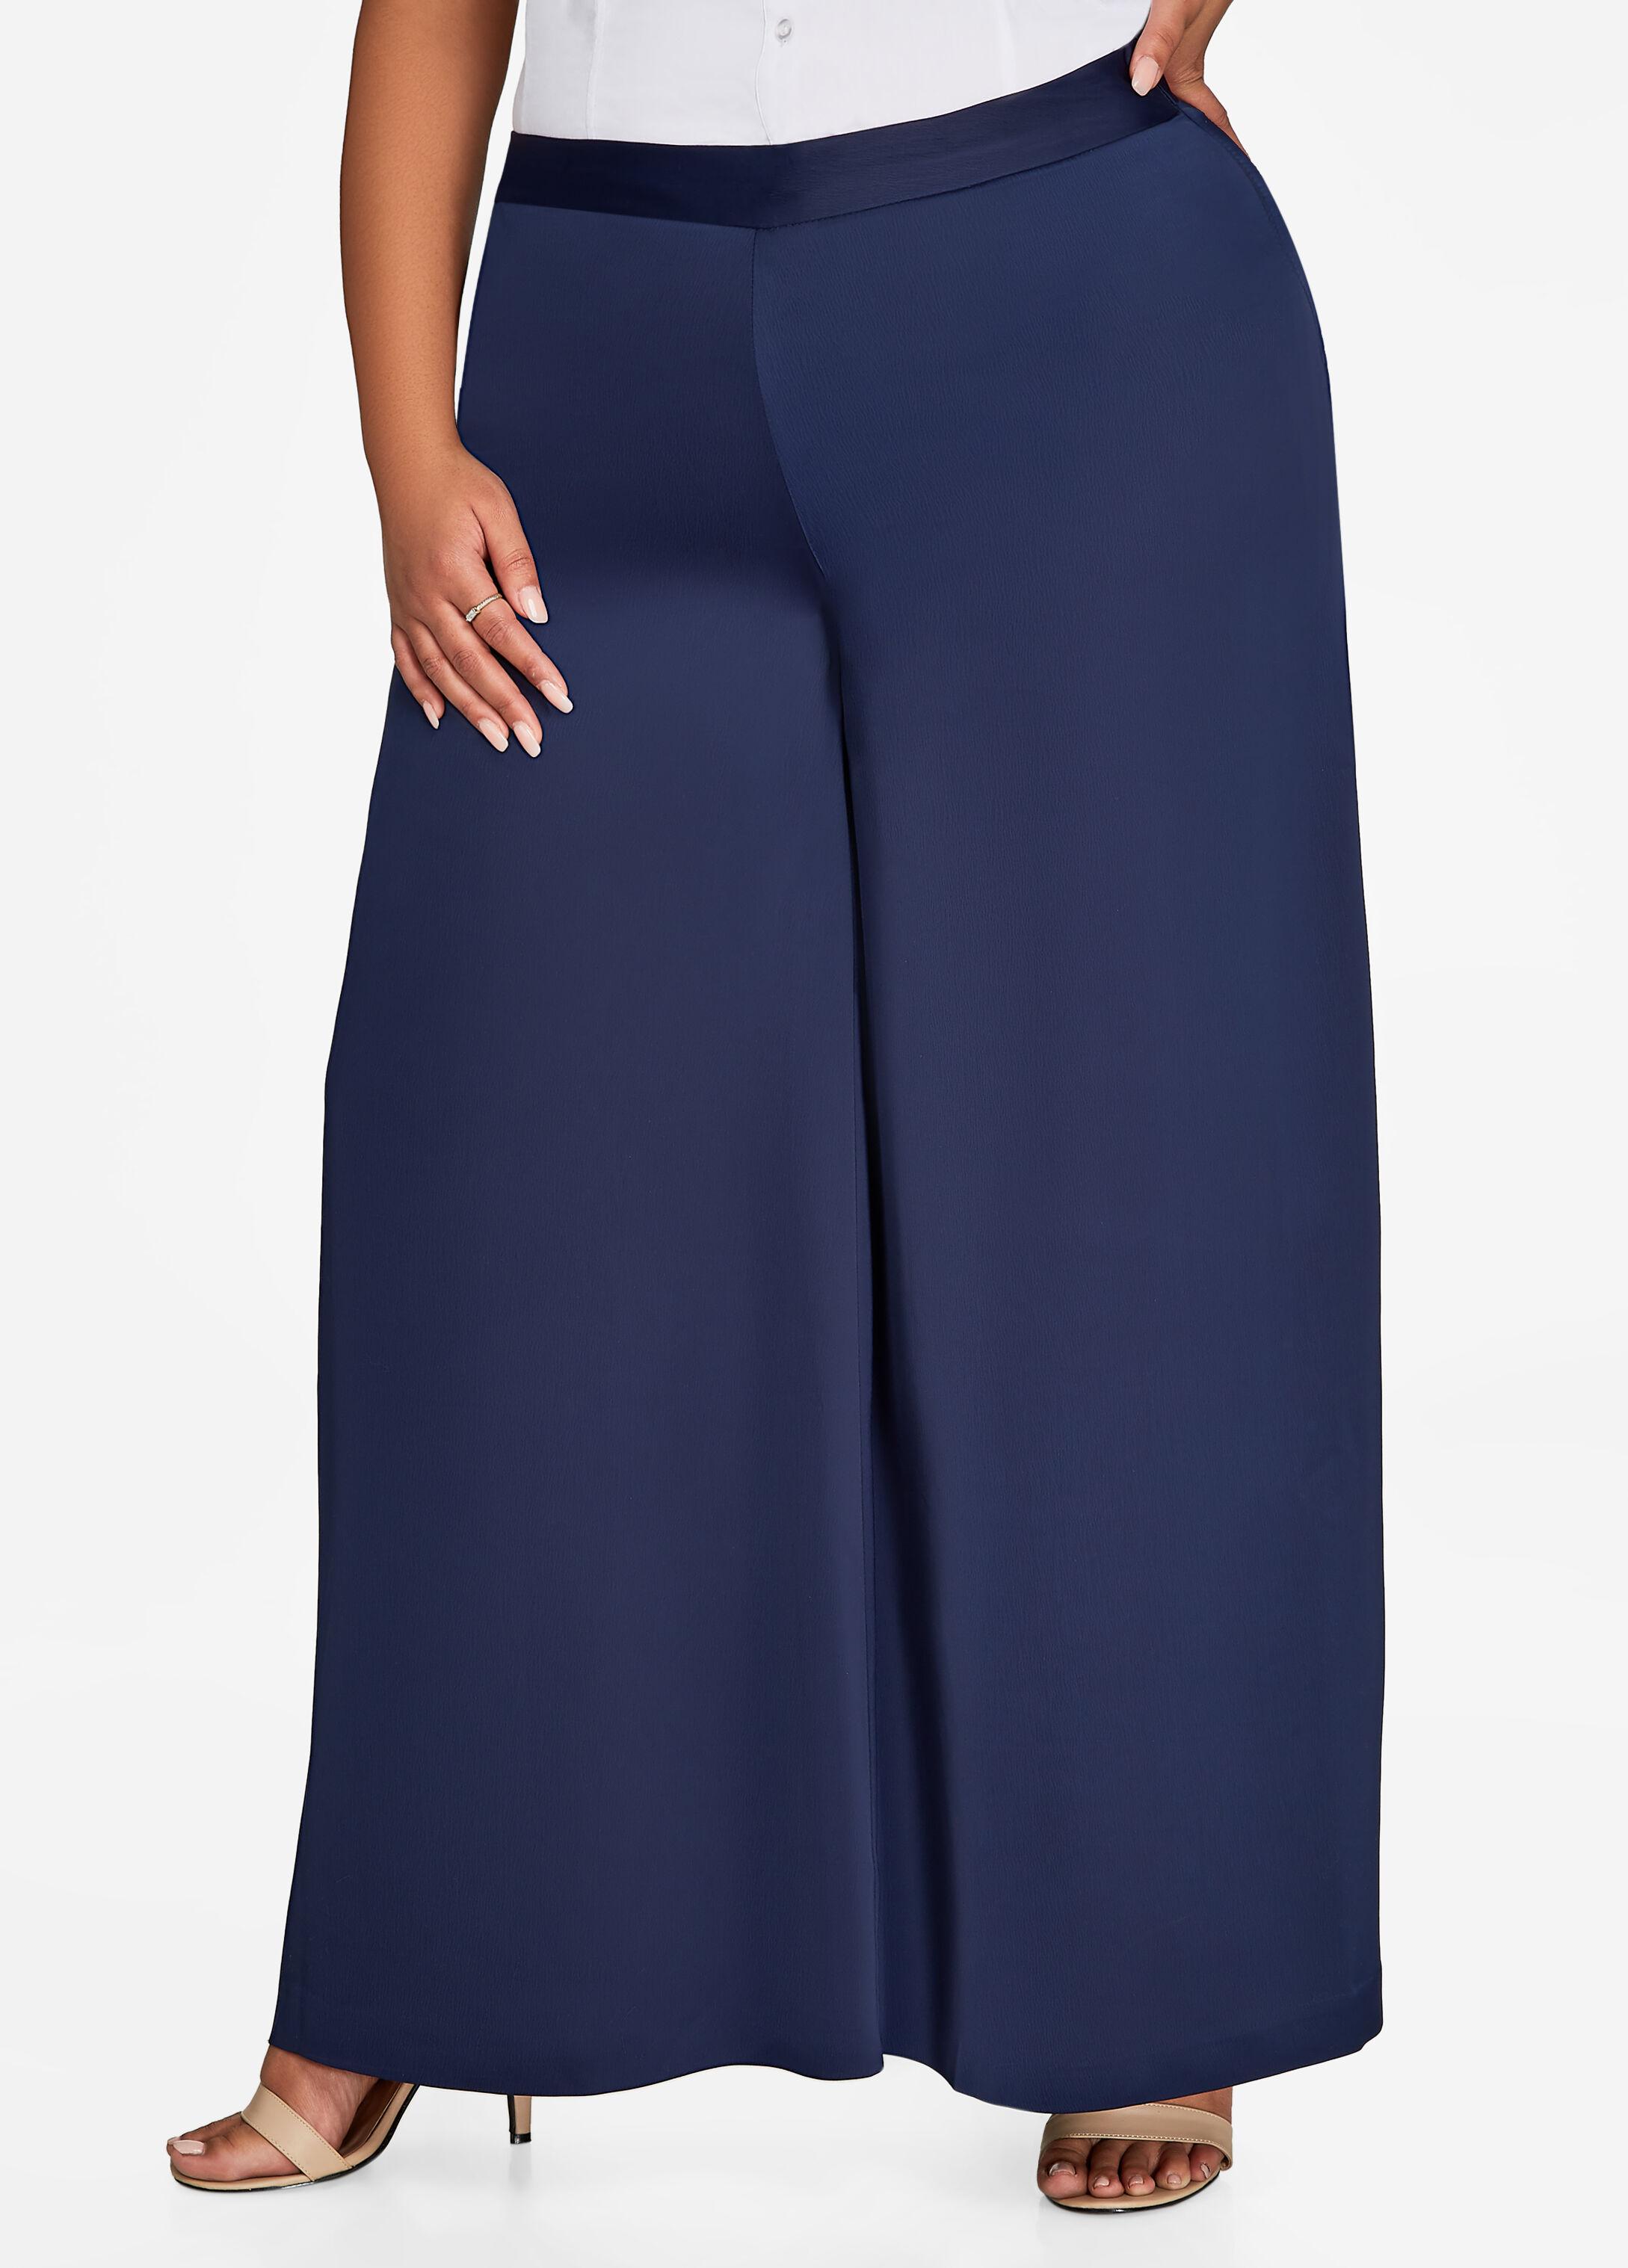 Pull-On Satin Wide Leg Dress Pant